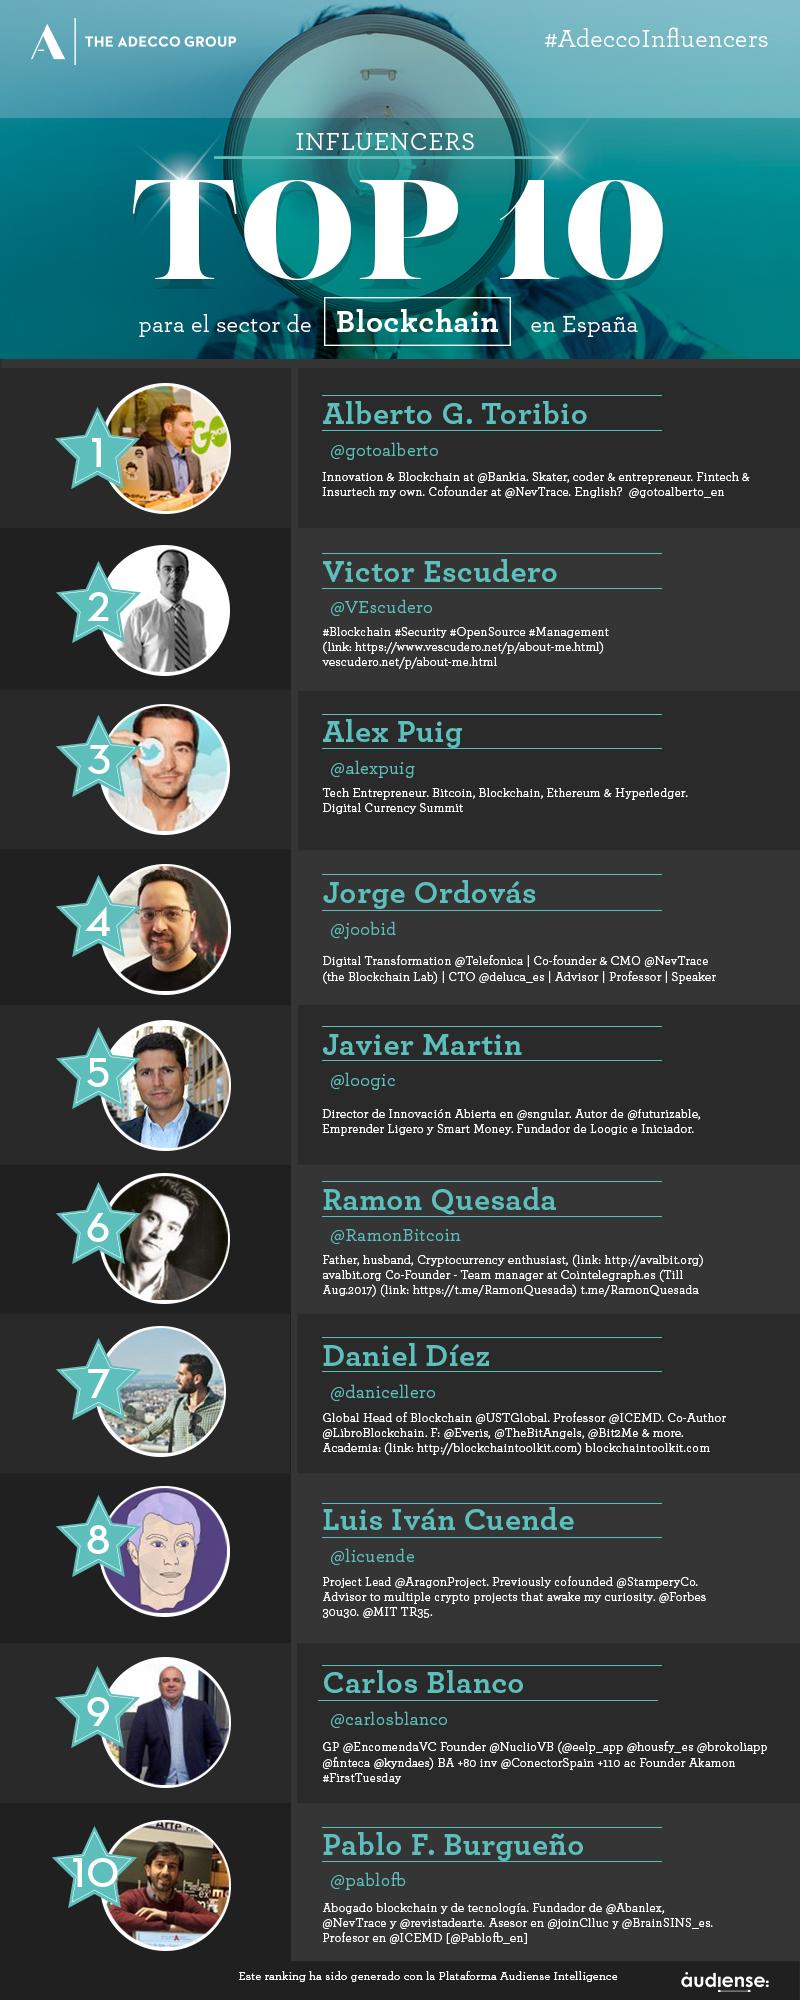 Top 10 influencers del sector Blockchain en España